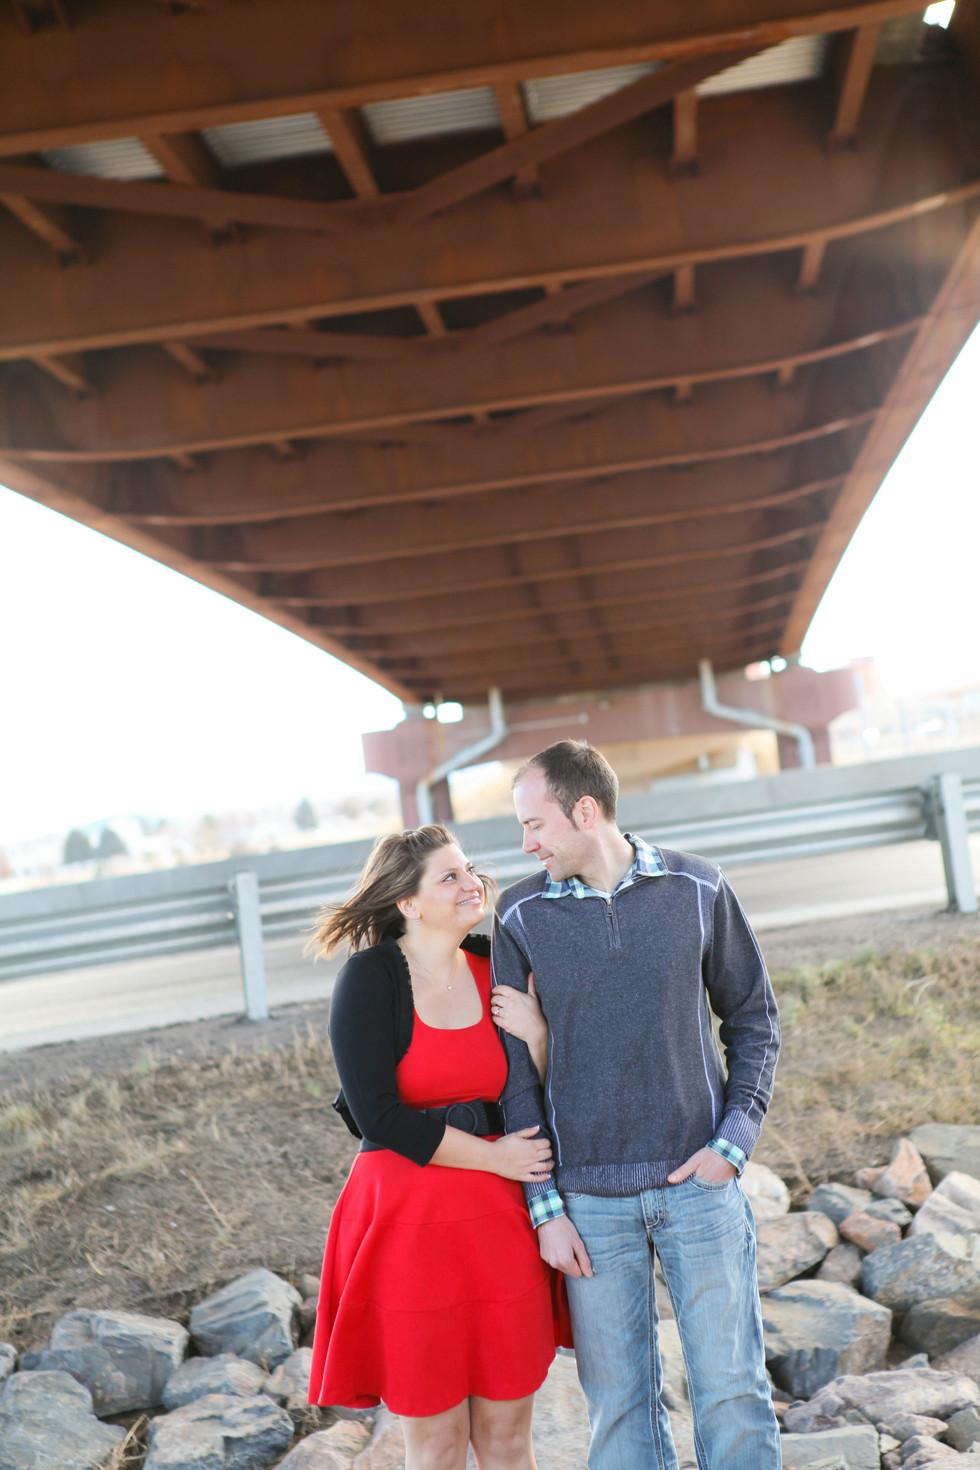 Chad & Anna's Engagement Session - Denver Wedding Photographer